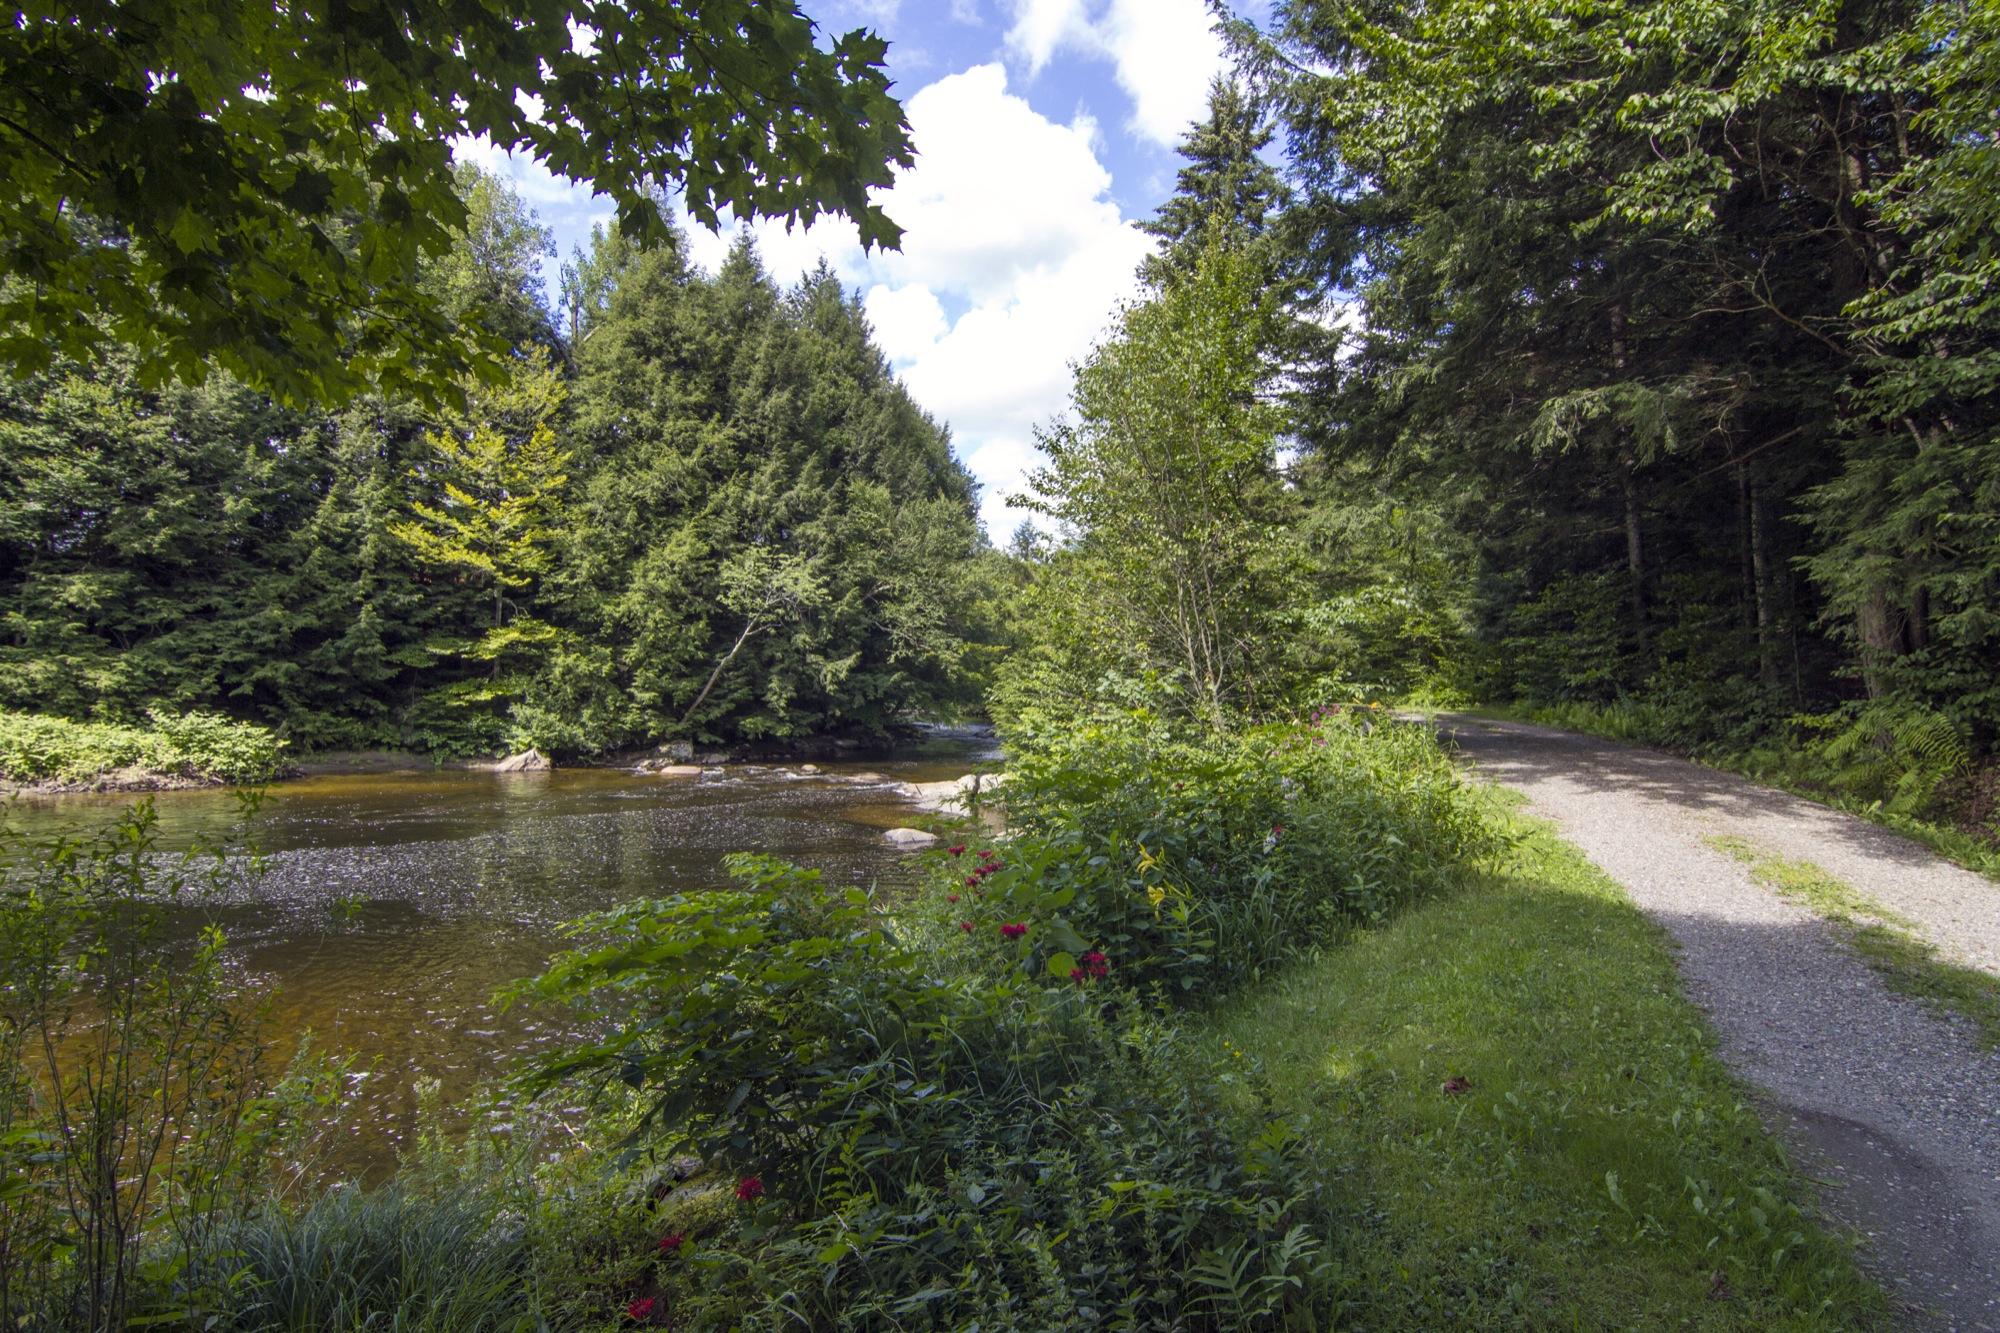 36-IMG_0554 Lipke Driveway along the River.jpg